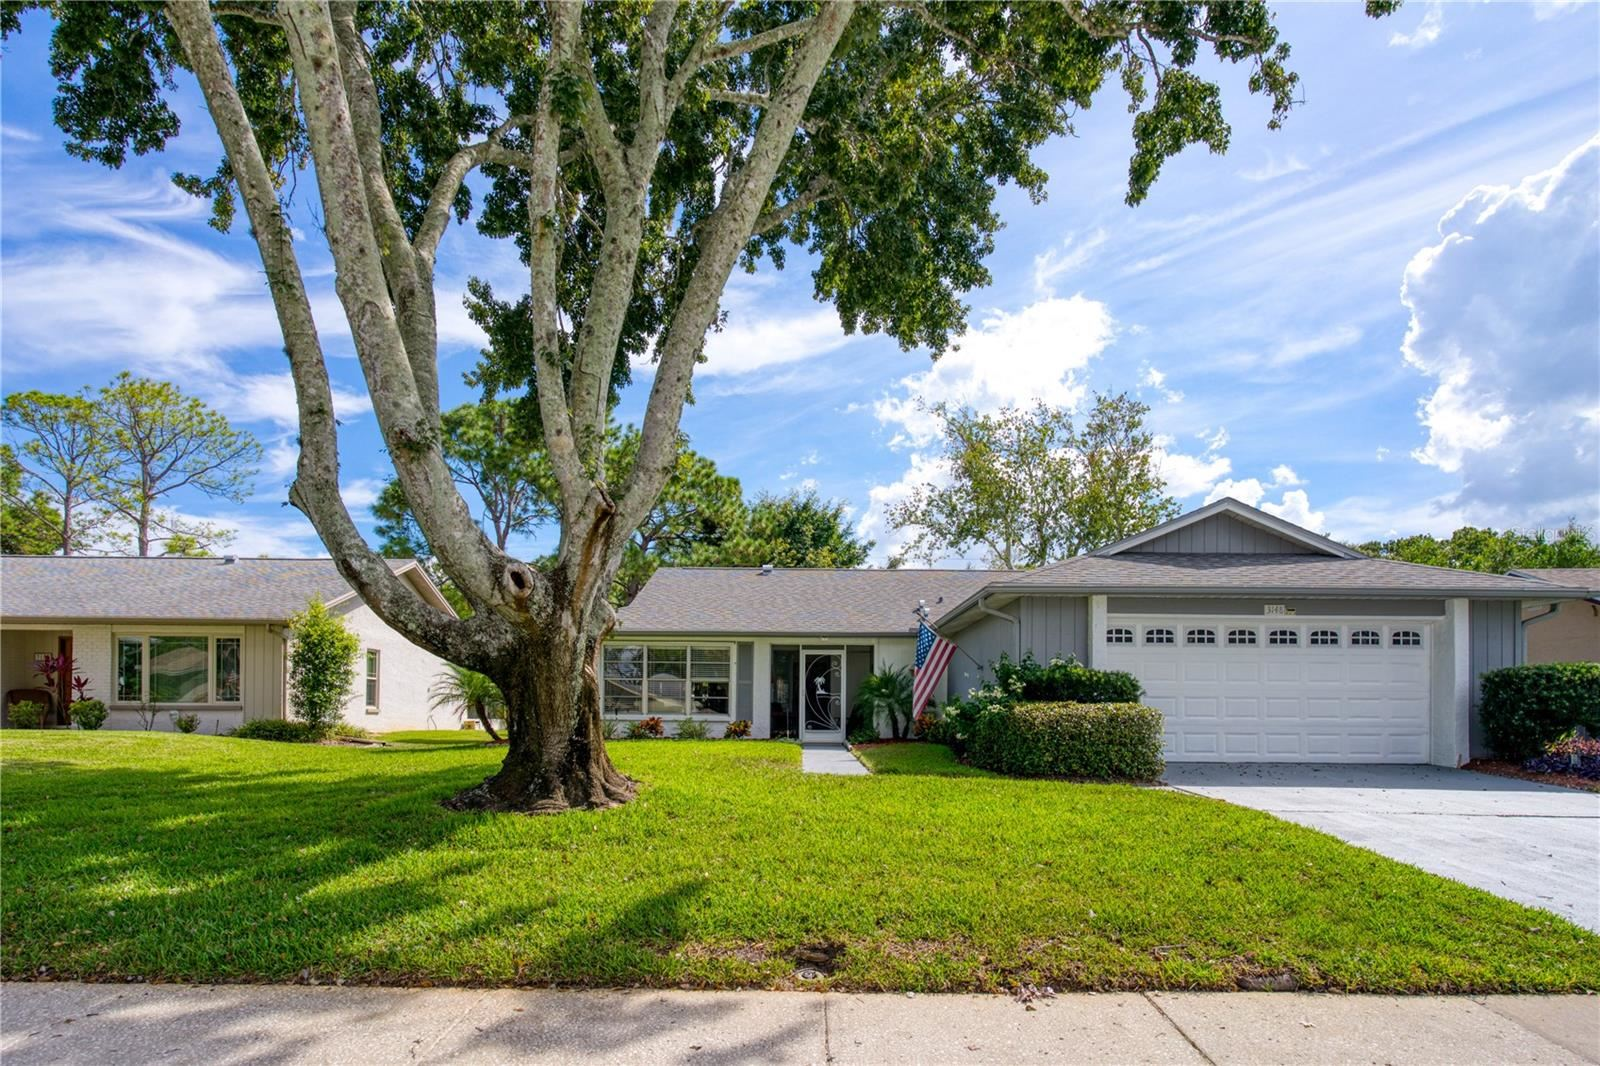 3148 BRUNSWICK CIRCLE, Palm Harbor, FL 34684 - #: U8139366